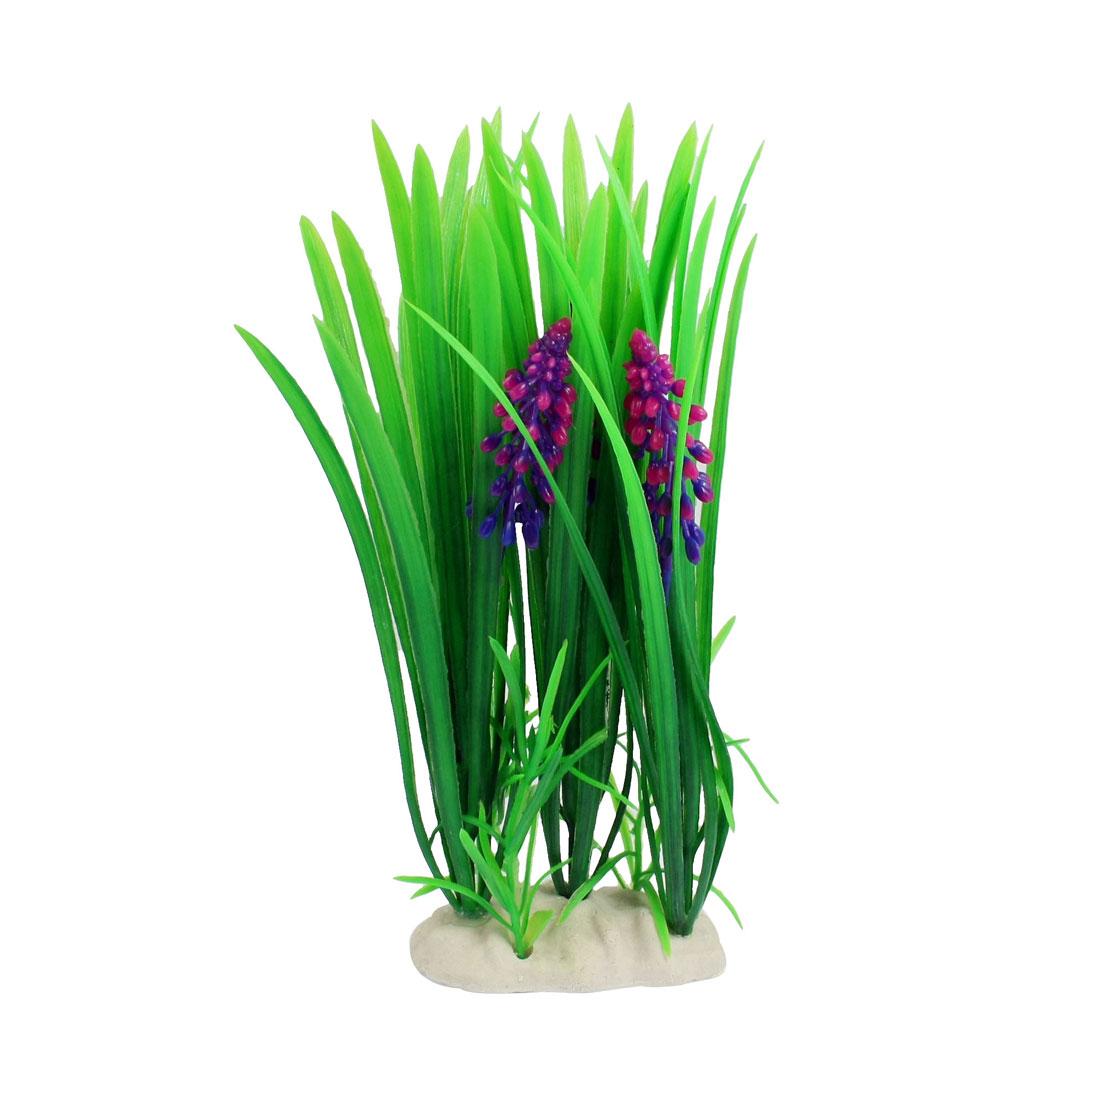 Fish Tank Fishbowl Decoration Blue Magenta Flowers Plastic Aquatic Plant